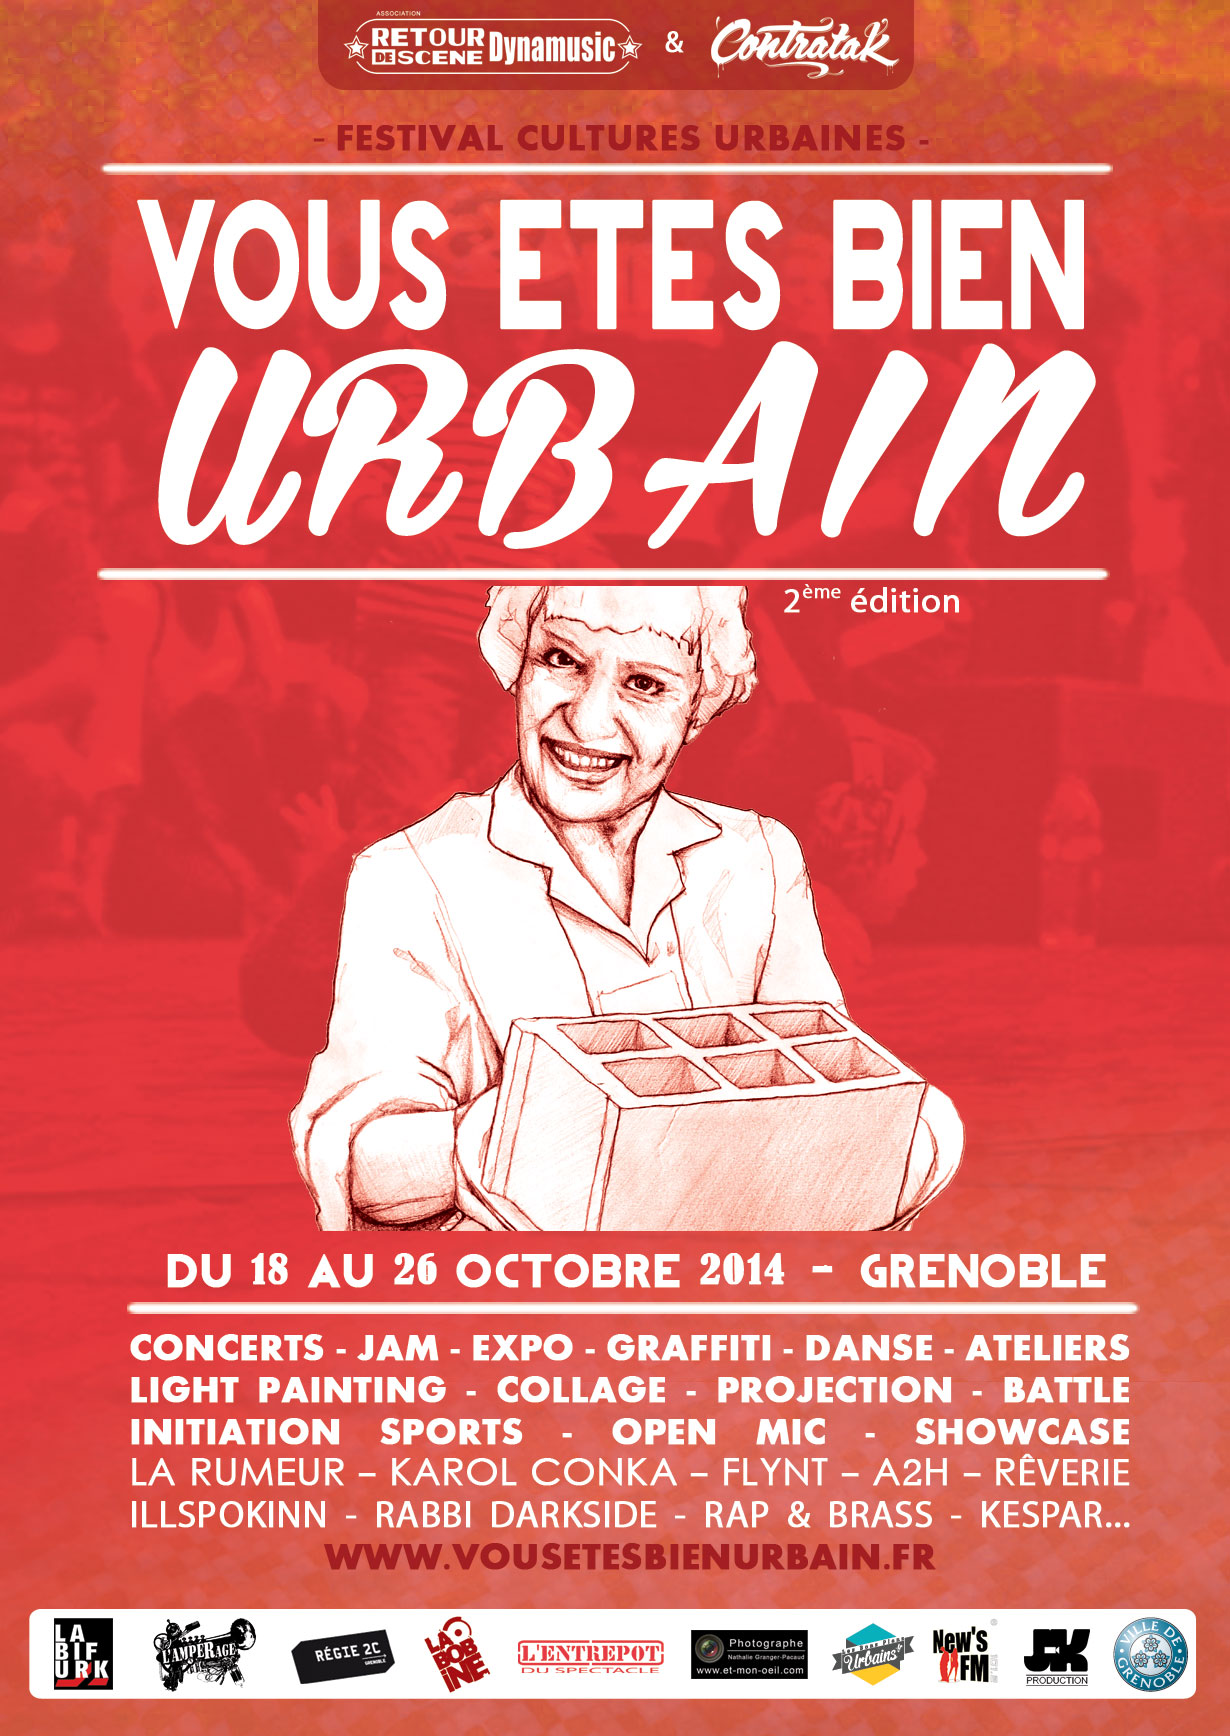 Festival Cultures Urbaines - Grenoble - 18/10/2014